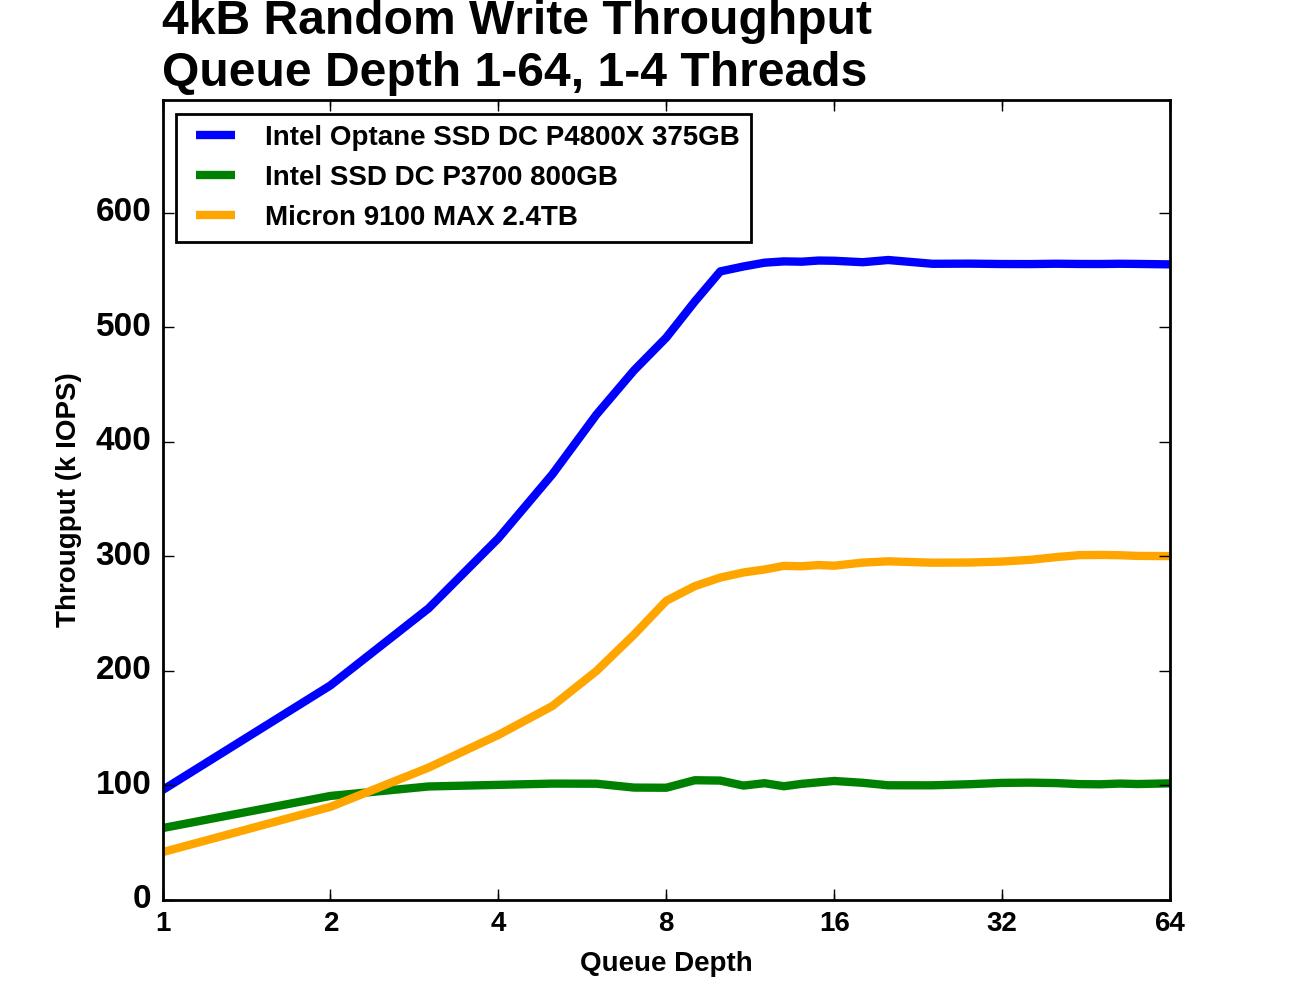 Random Write Throughput